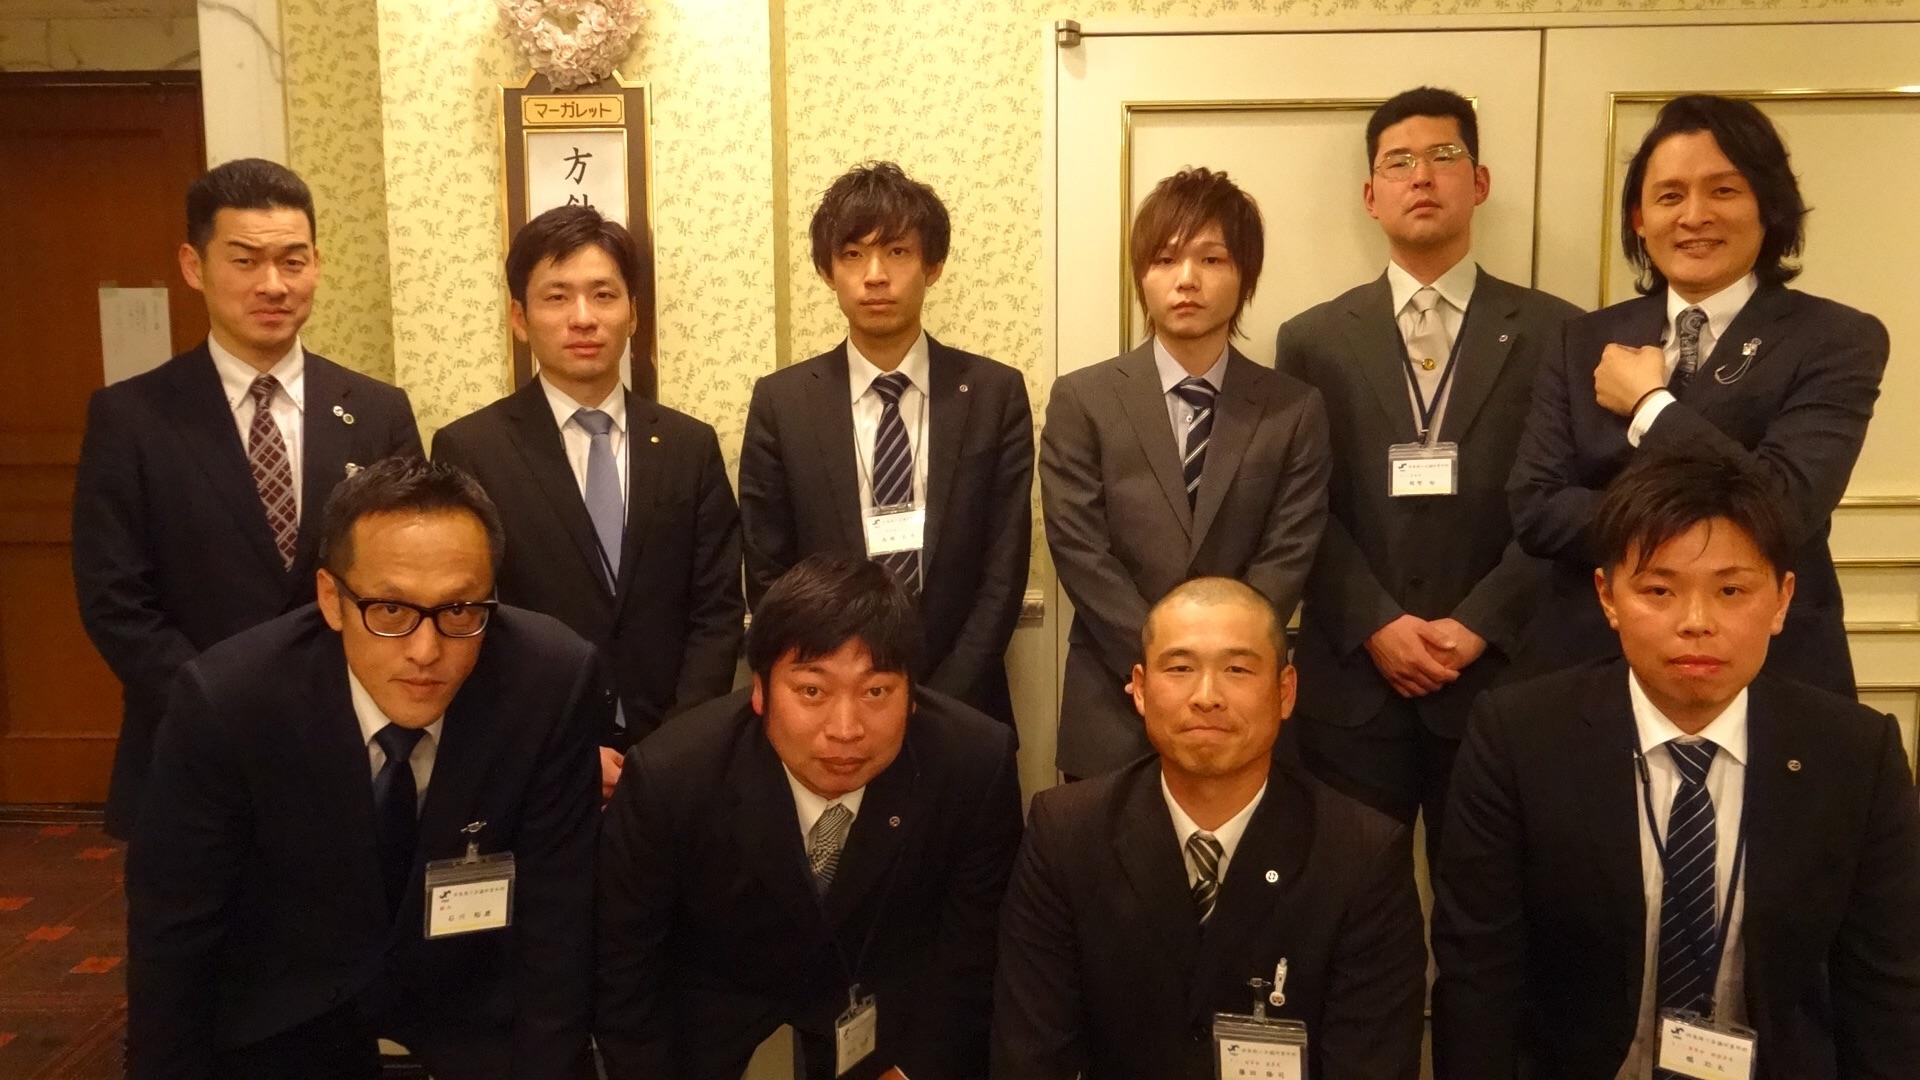 f:id:masanori-kato1972:20190331103716j:image